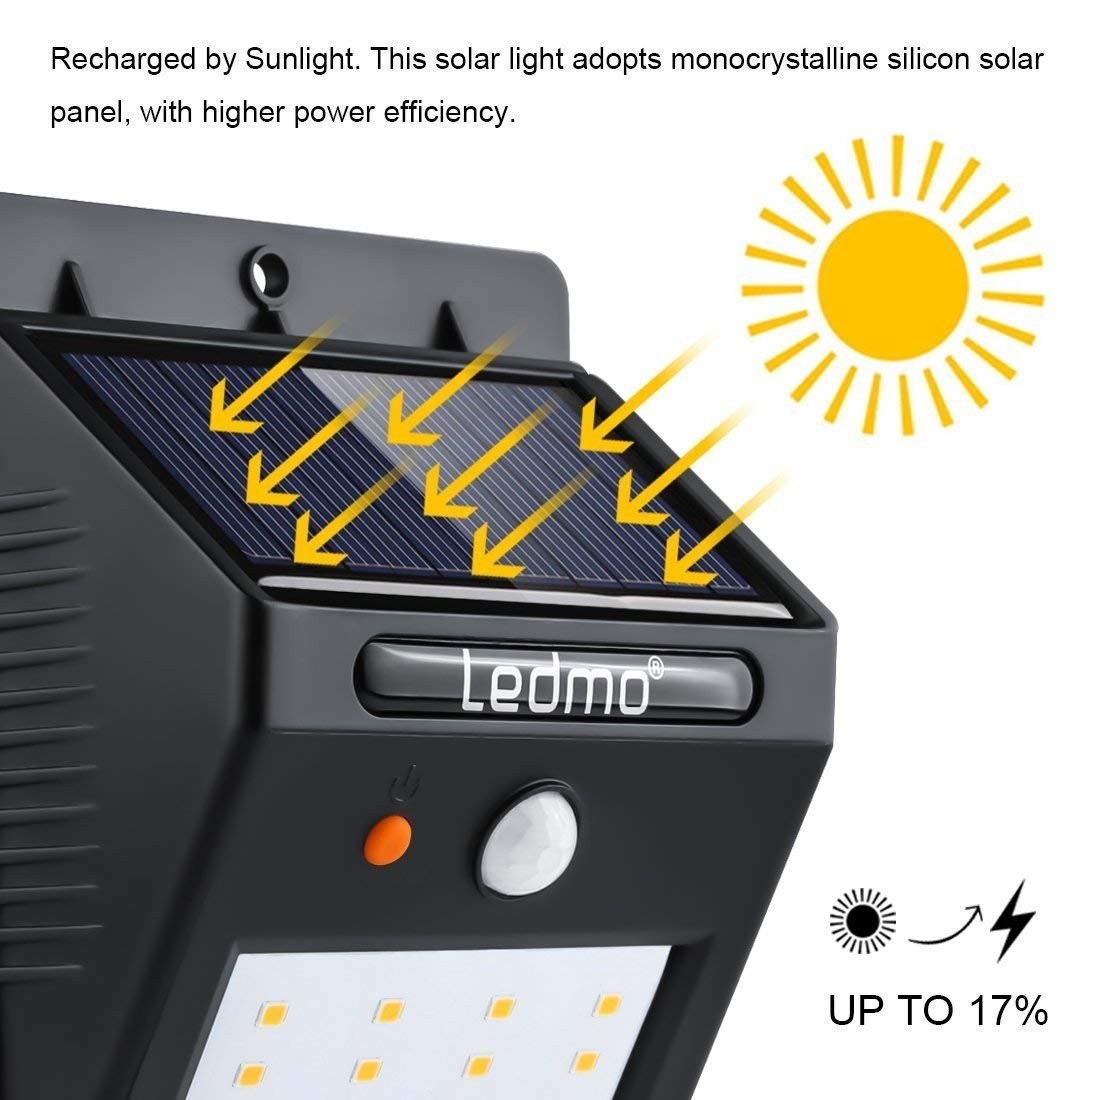 LEDMO Luces Solares 20 LEDs, blanco cálido 3000K PIR Sensor de movimiento y sensor ligero impermeable Luz de solar LED con modos inteligentes para la pared ...